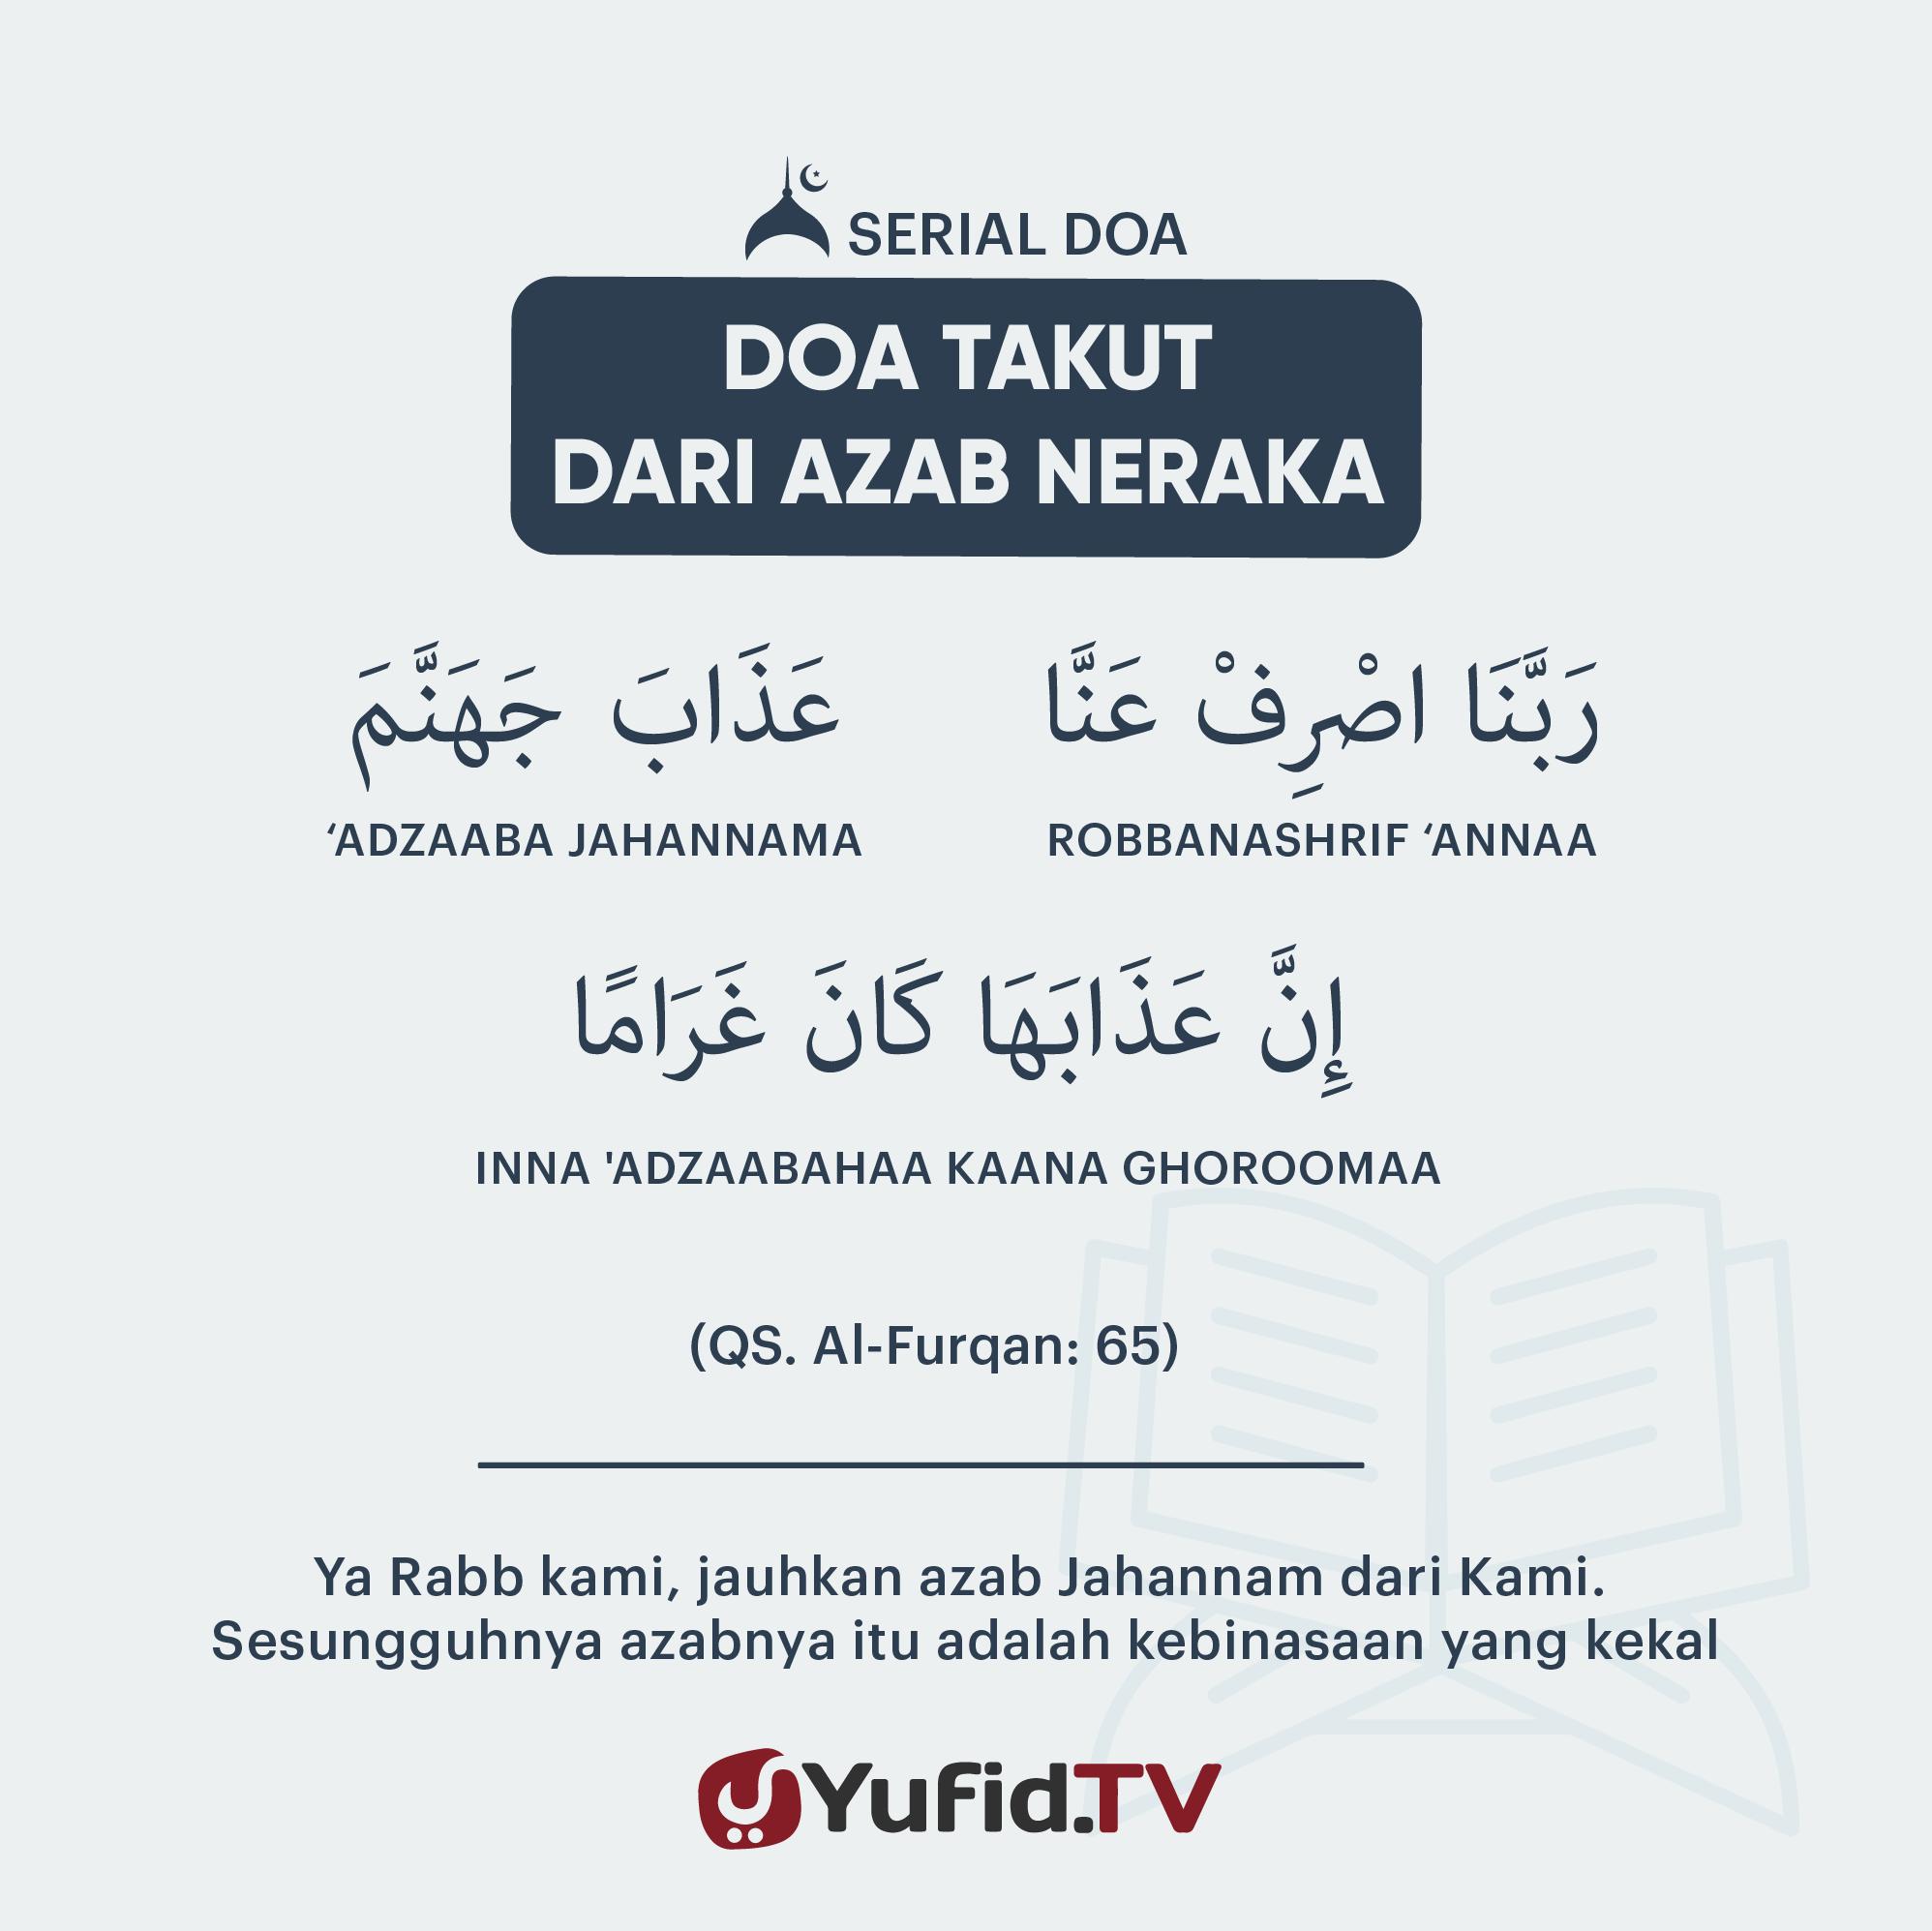 Doa Takut dari Azab Neraka